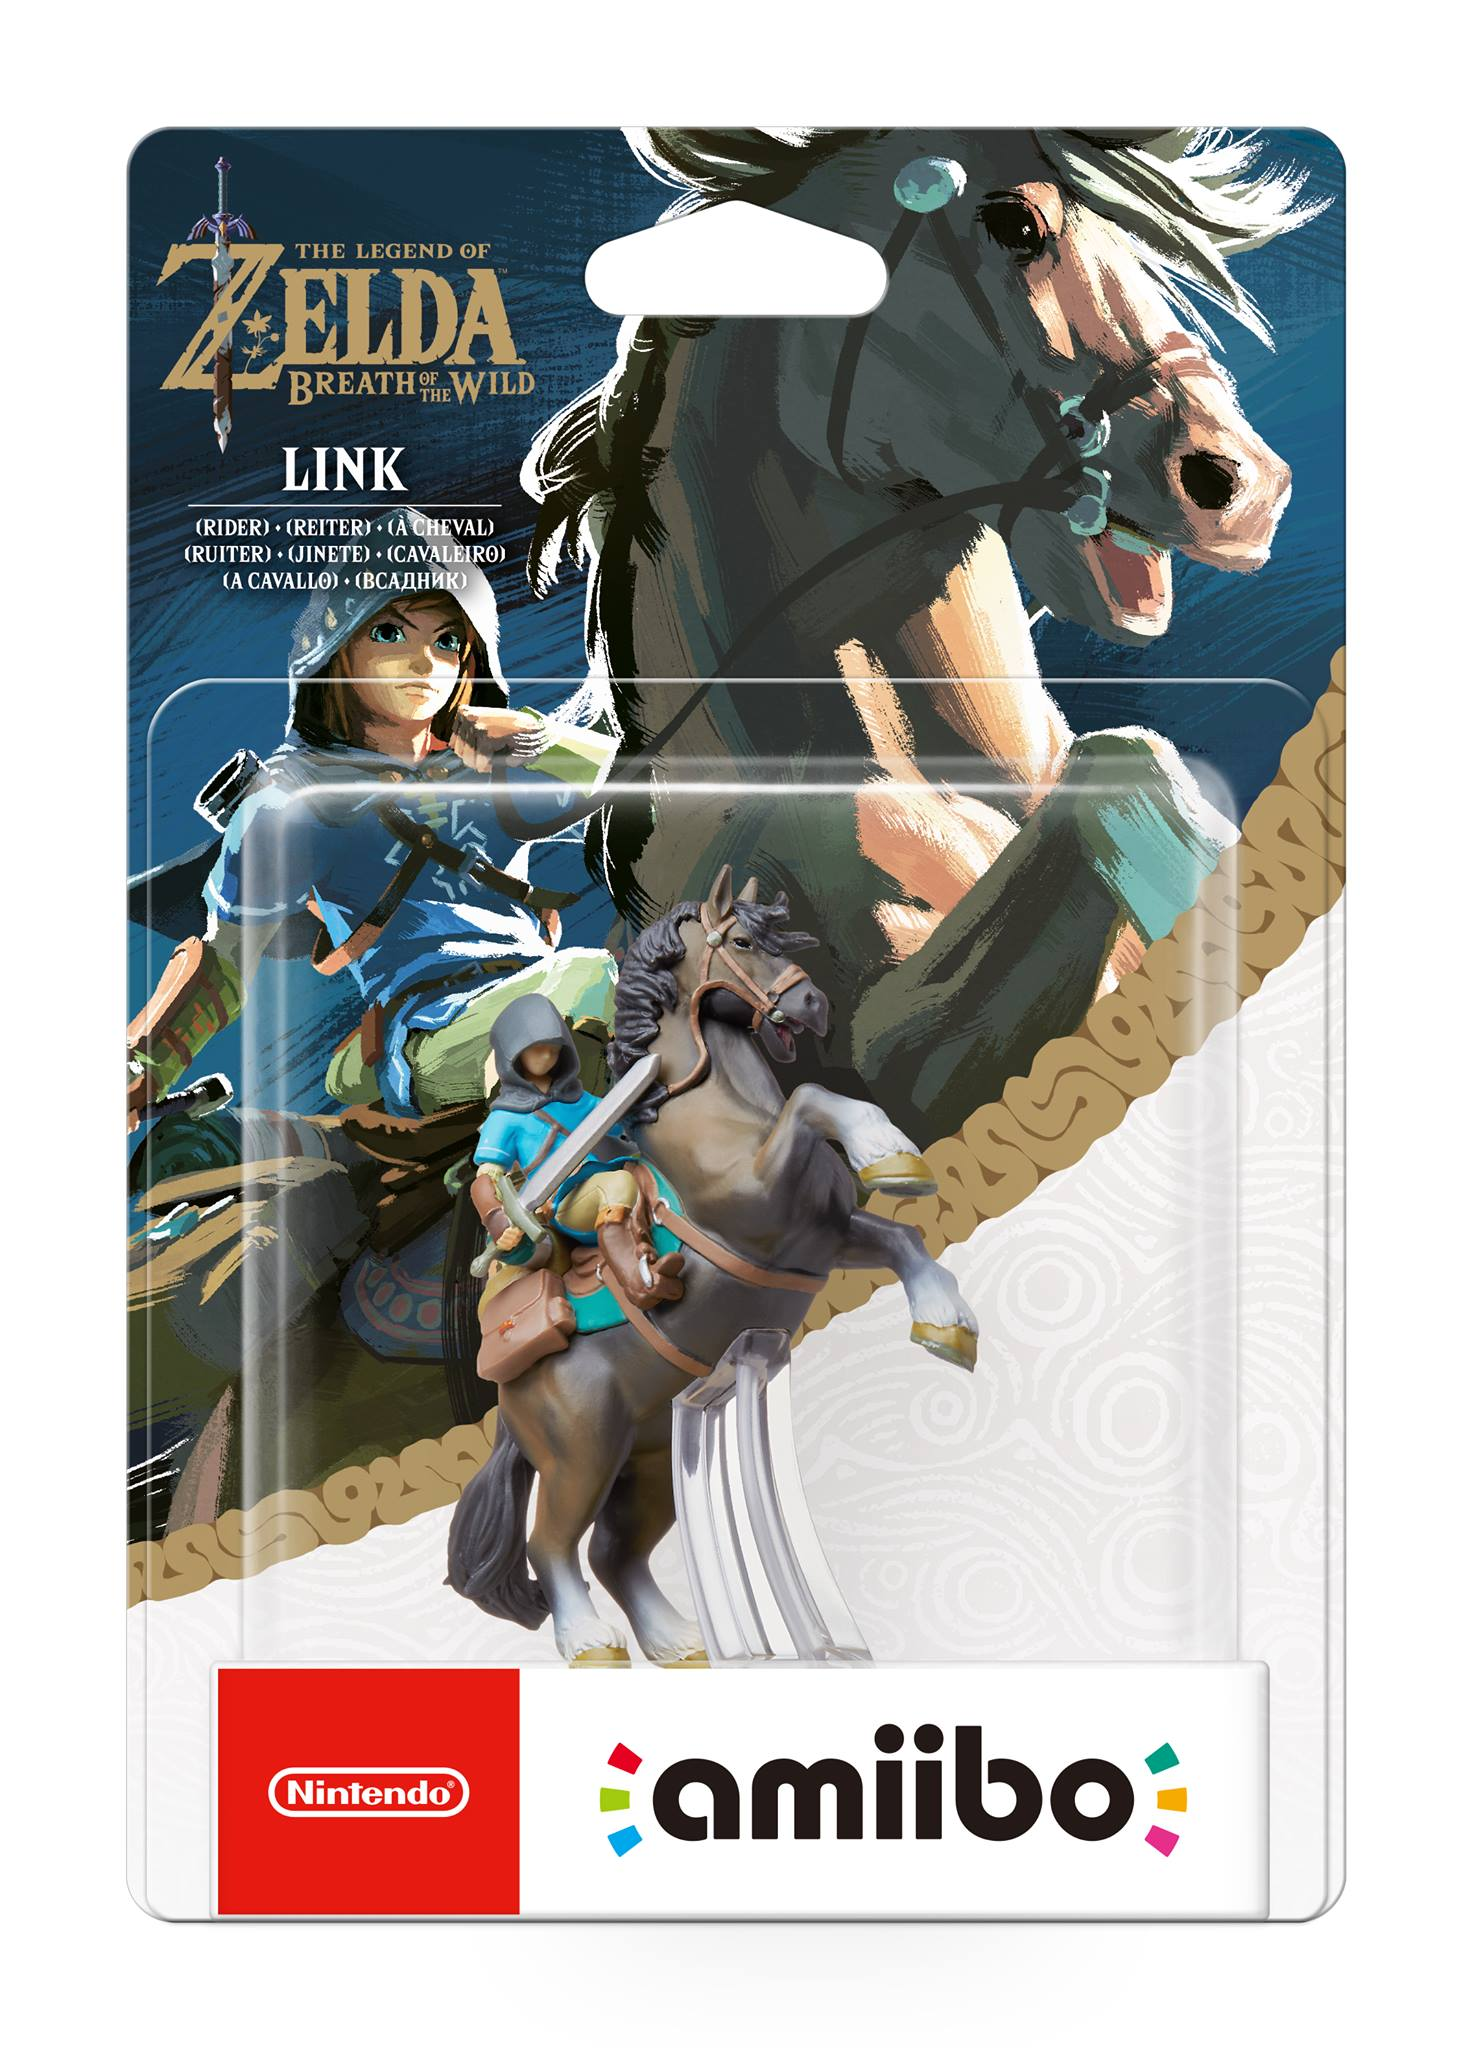 Link a the-legend-of-zelda-breath-of-the-wild-amiibo-nintendo-foto-07